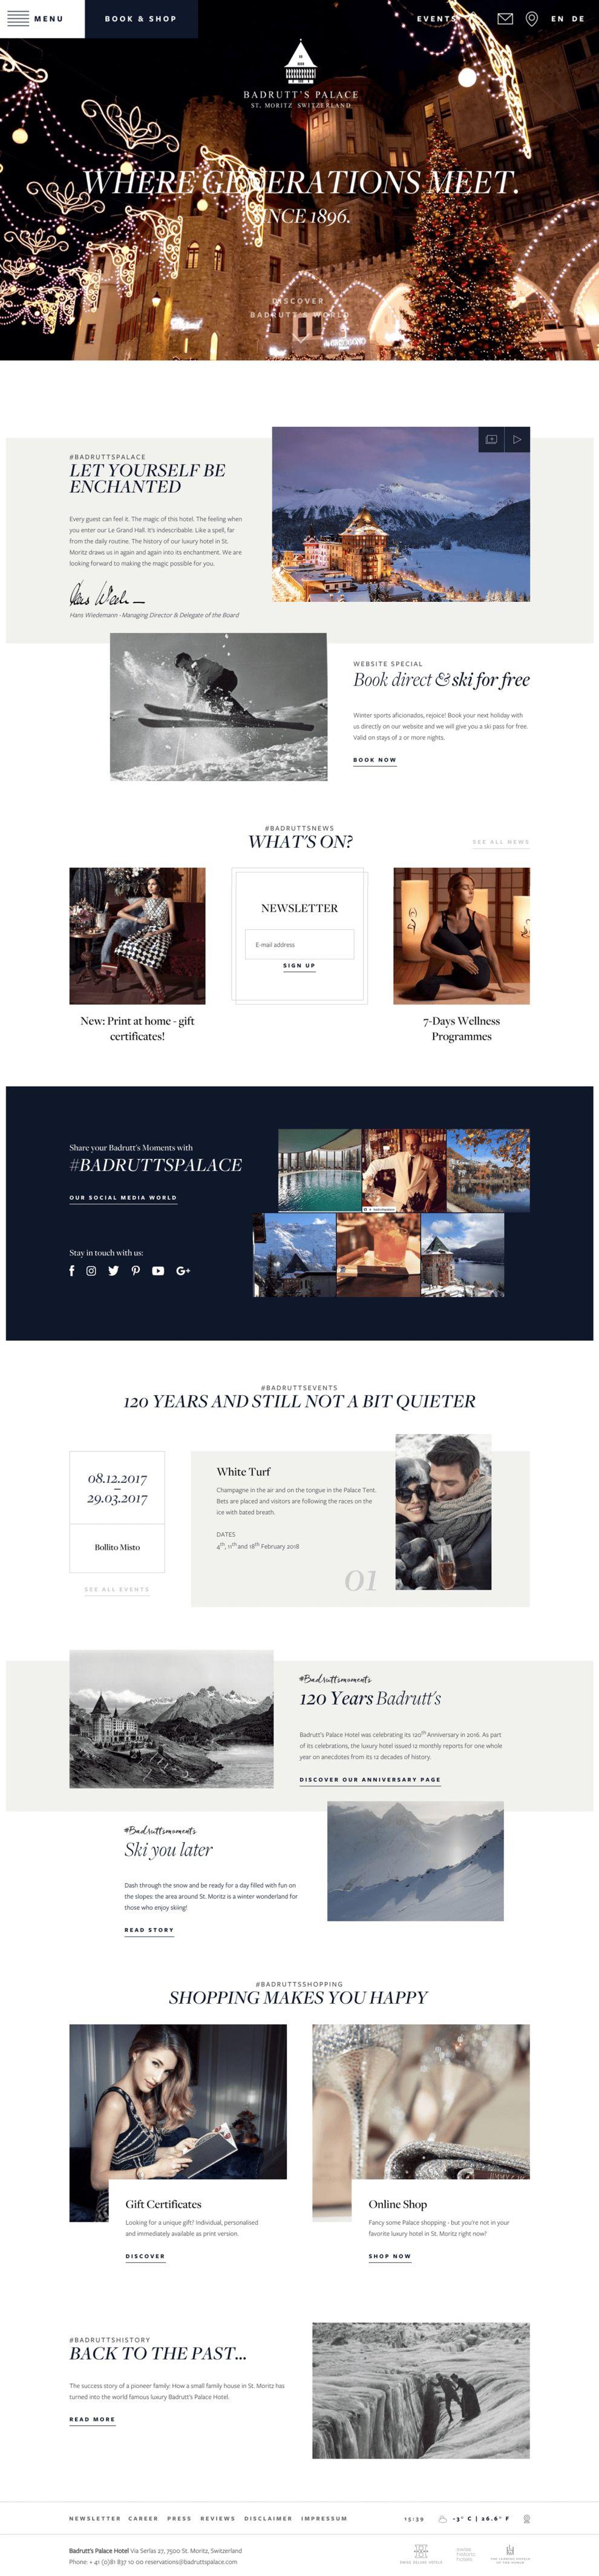 Badrutt's Palace Elegant Homepage